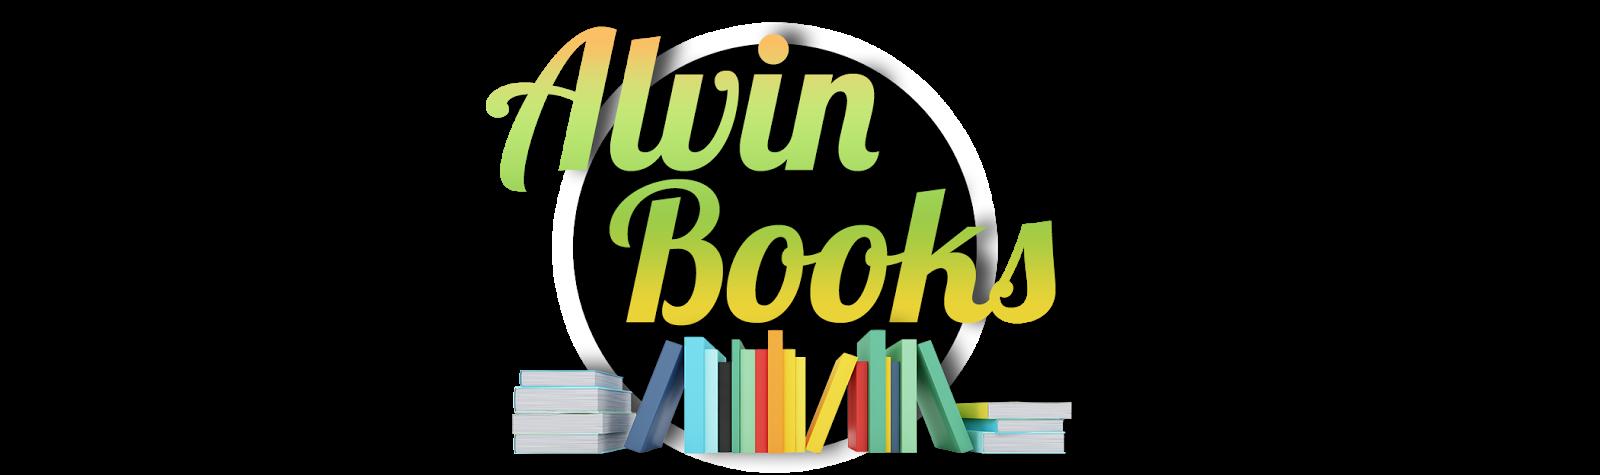 Alvin Books